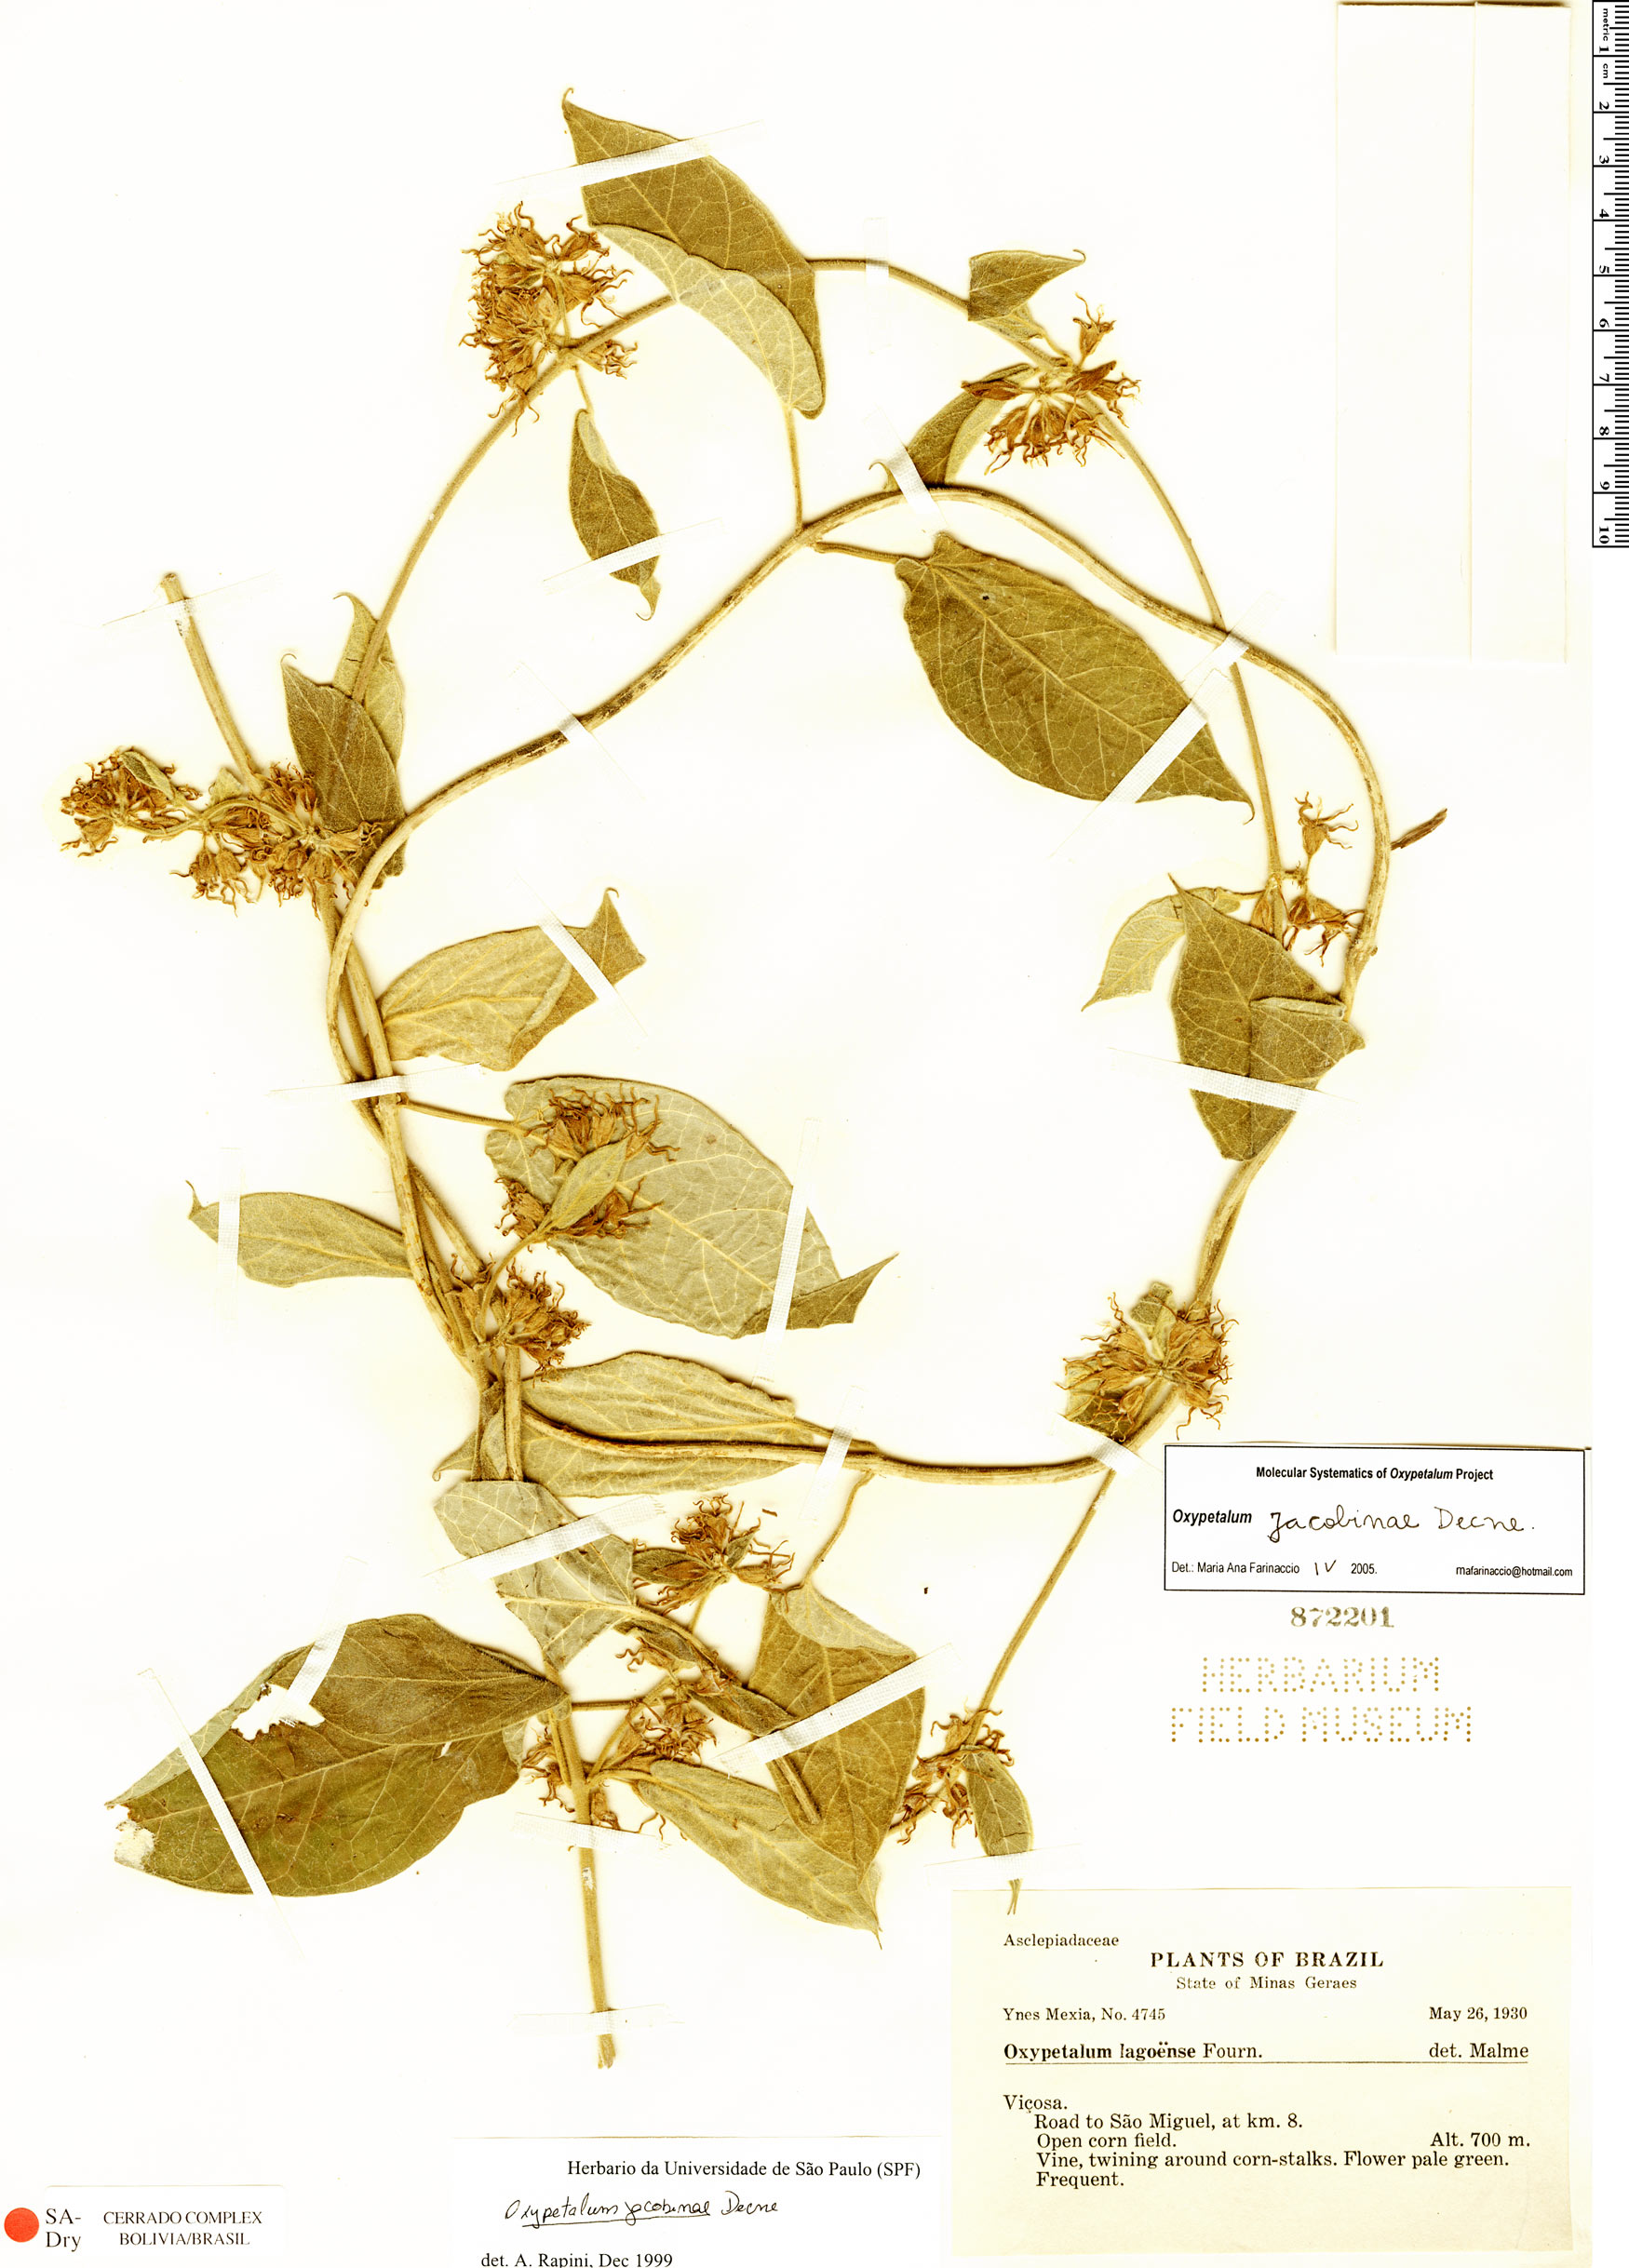 Specimen: Oxypetalum jacobinae